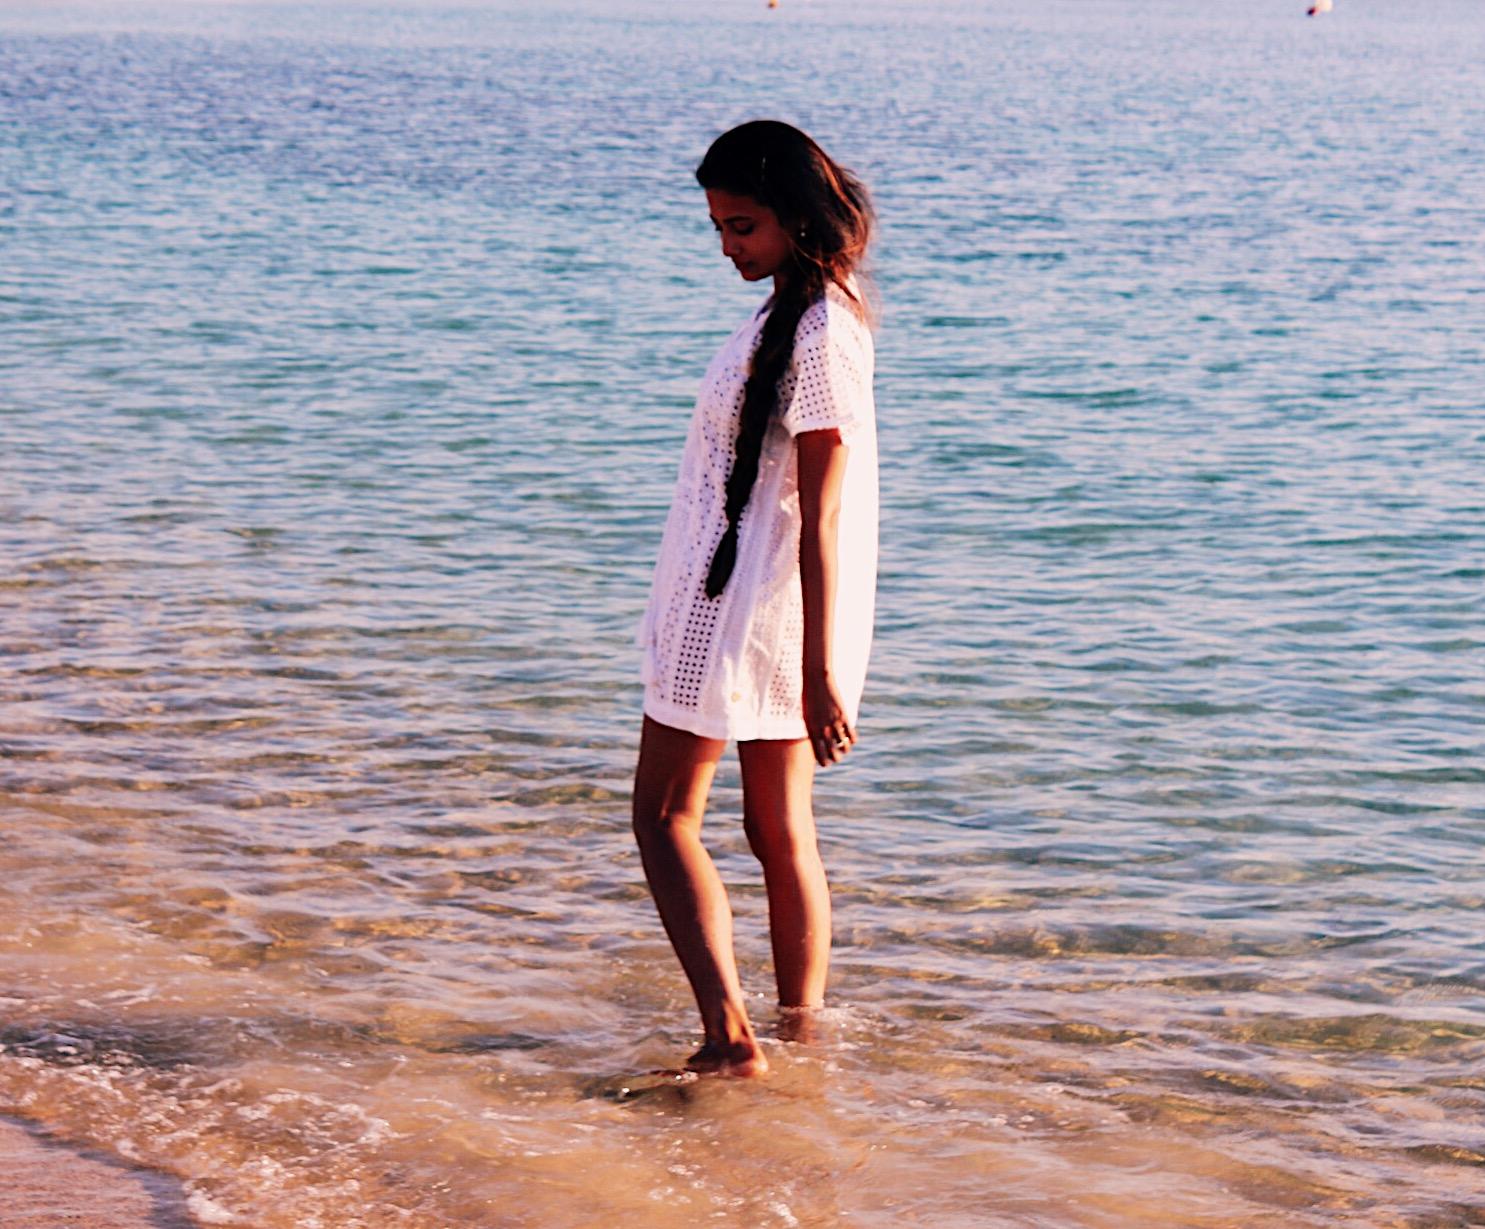 the good beach life, dryrobe, simply swim, beach holiday essentials, naxos greece, indian blogger, uk blog